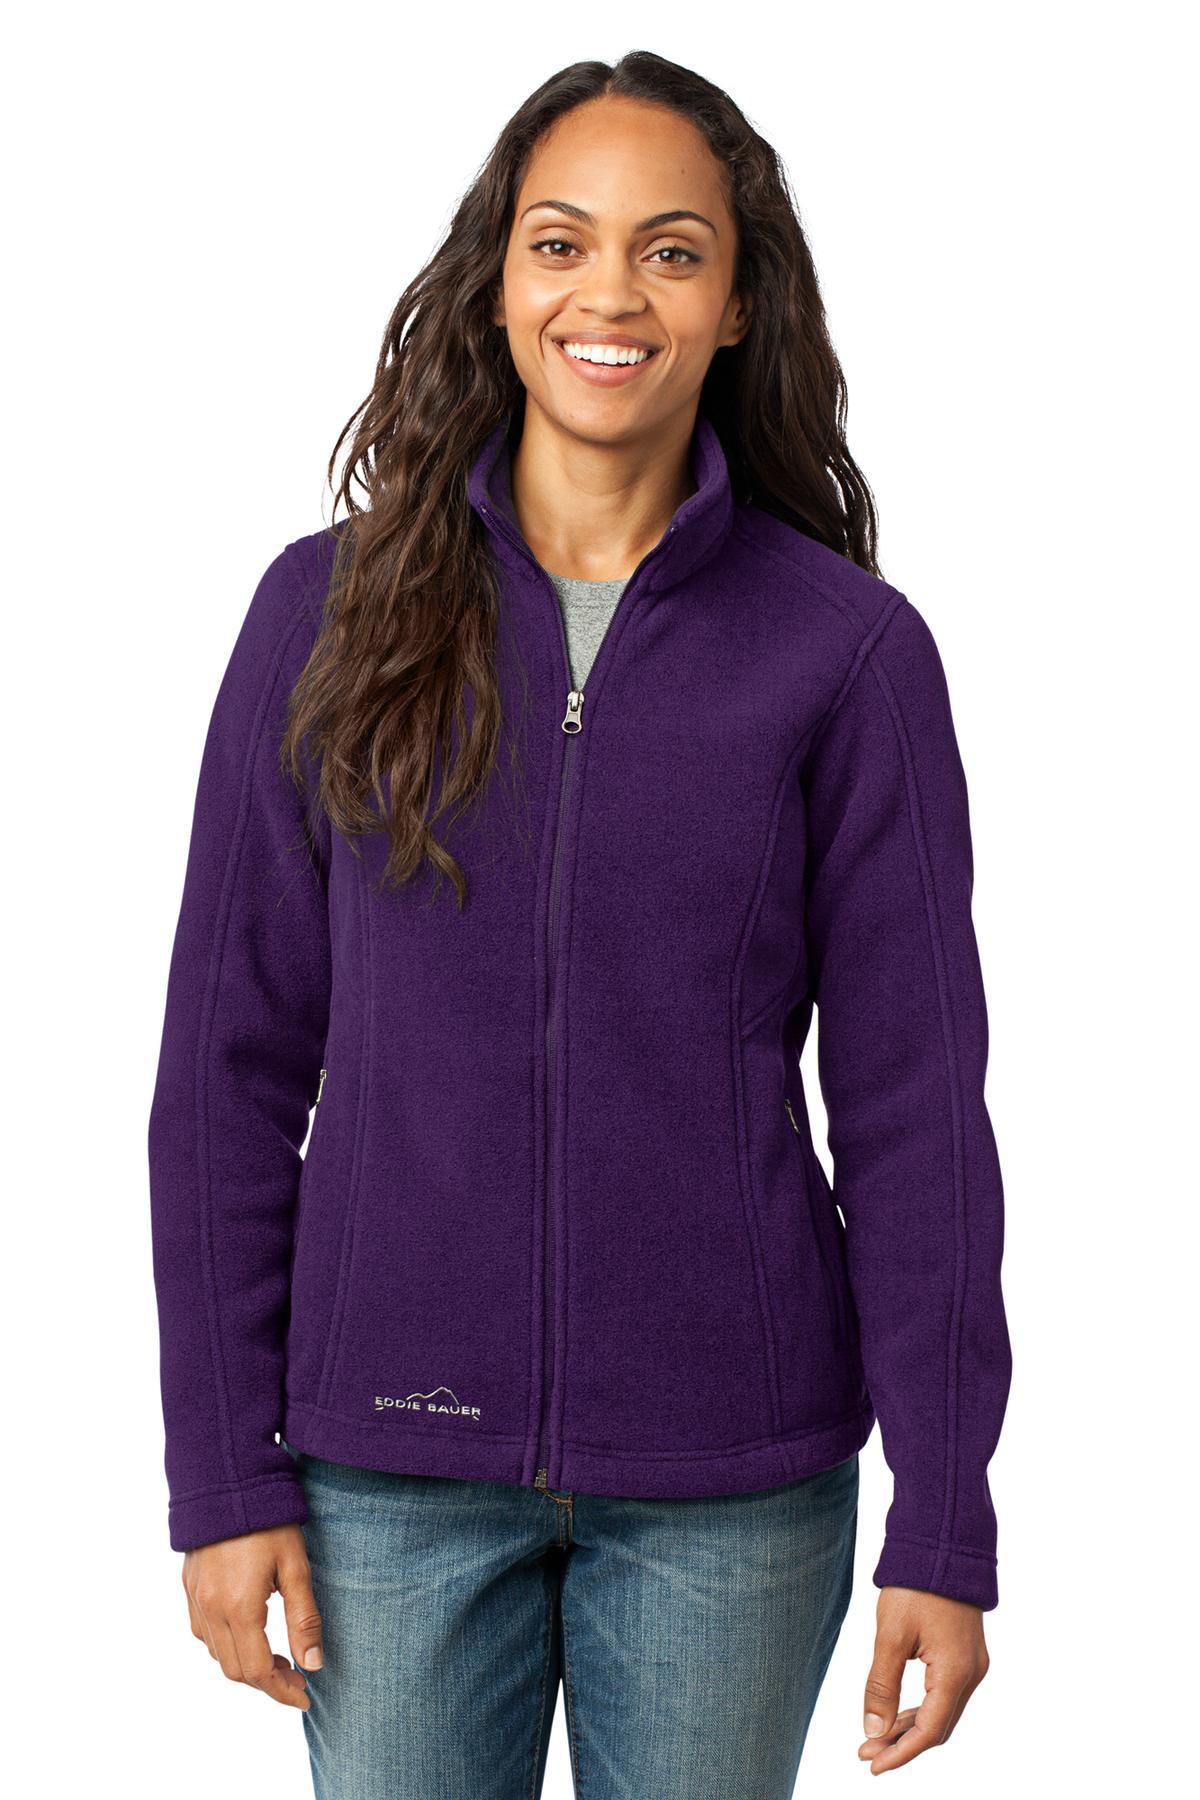 Eddie Bauer - Ladies Full-Zip Fleece Jacket.EB201